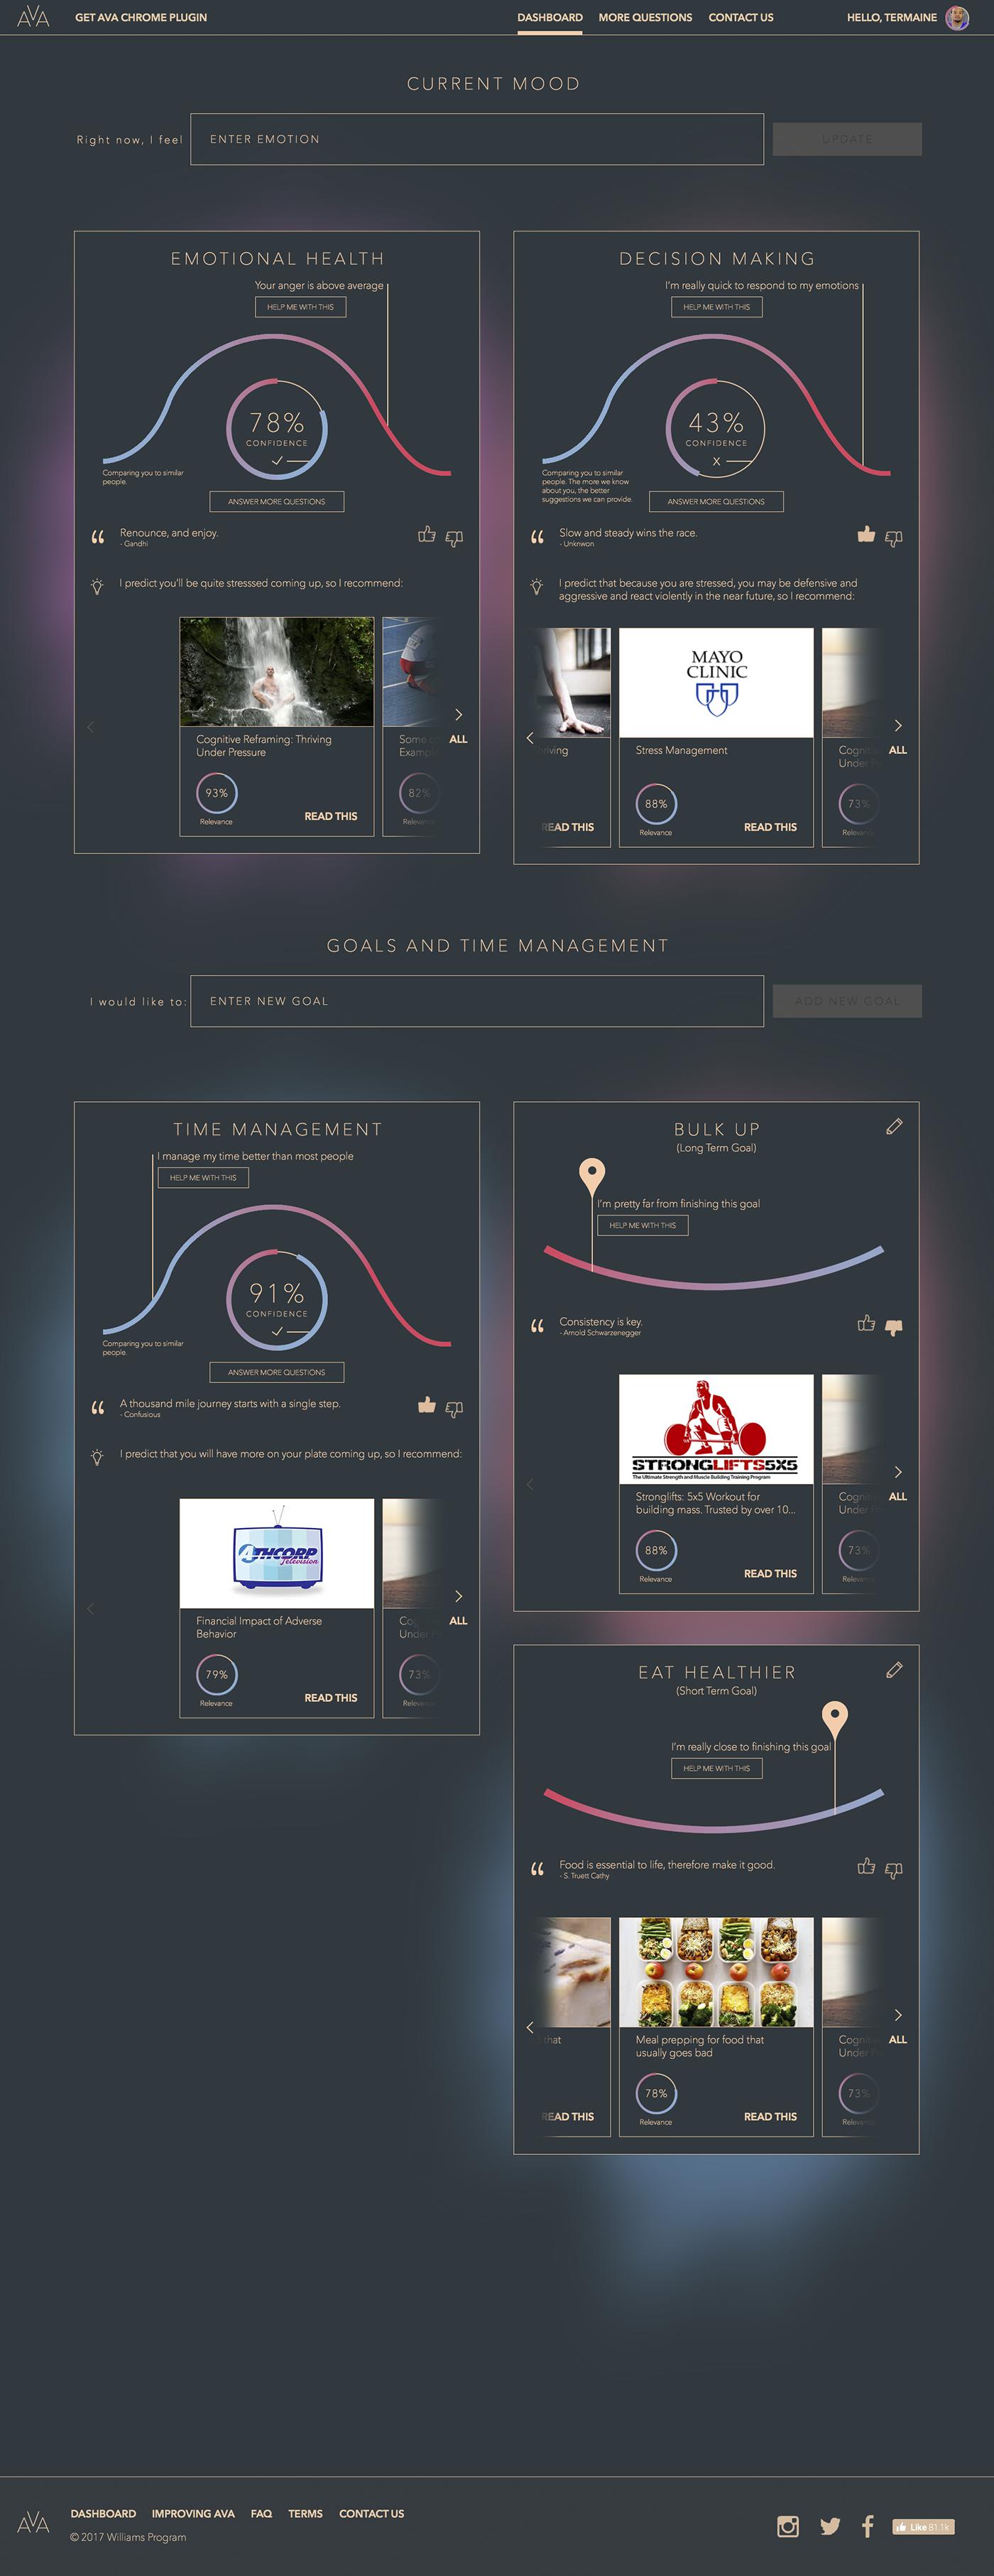 machine learning ux UI design desktop web app Predictive Behavior